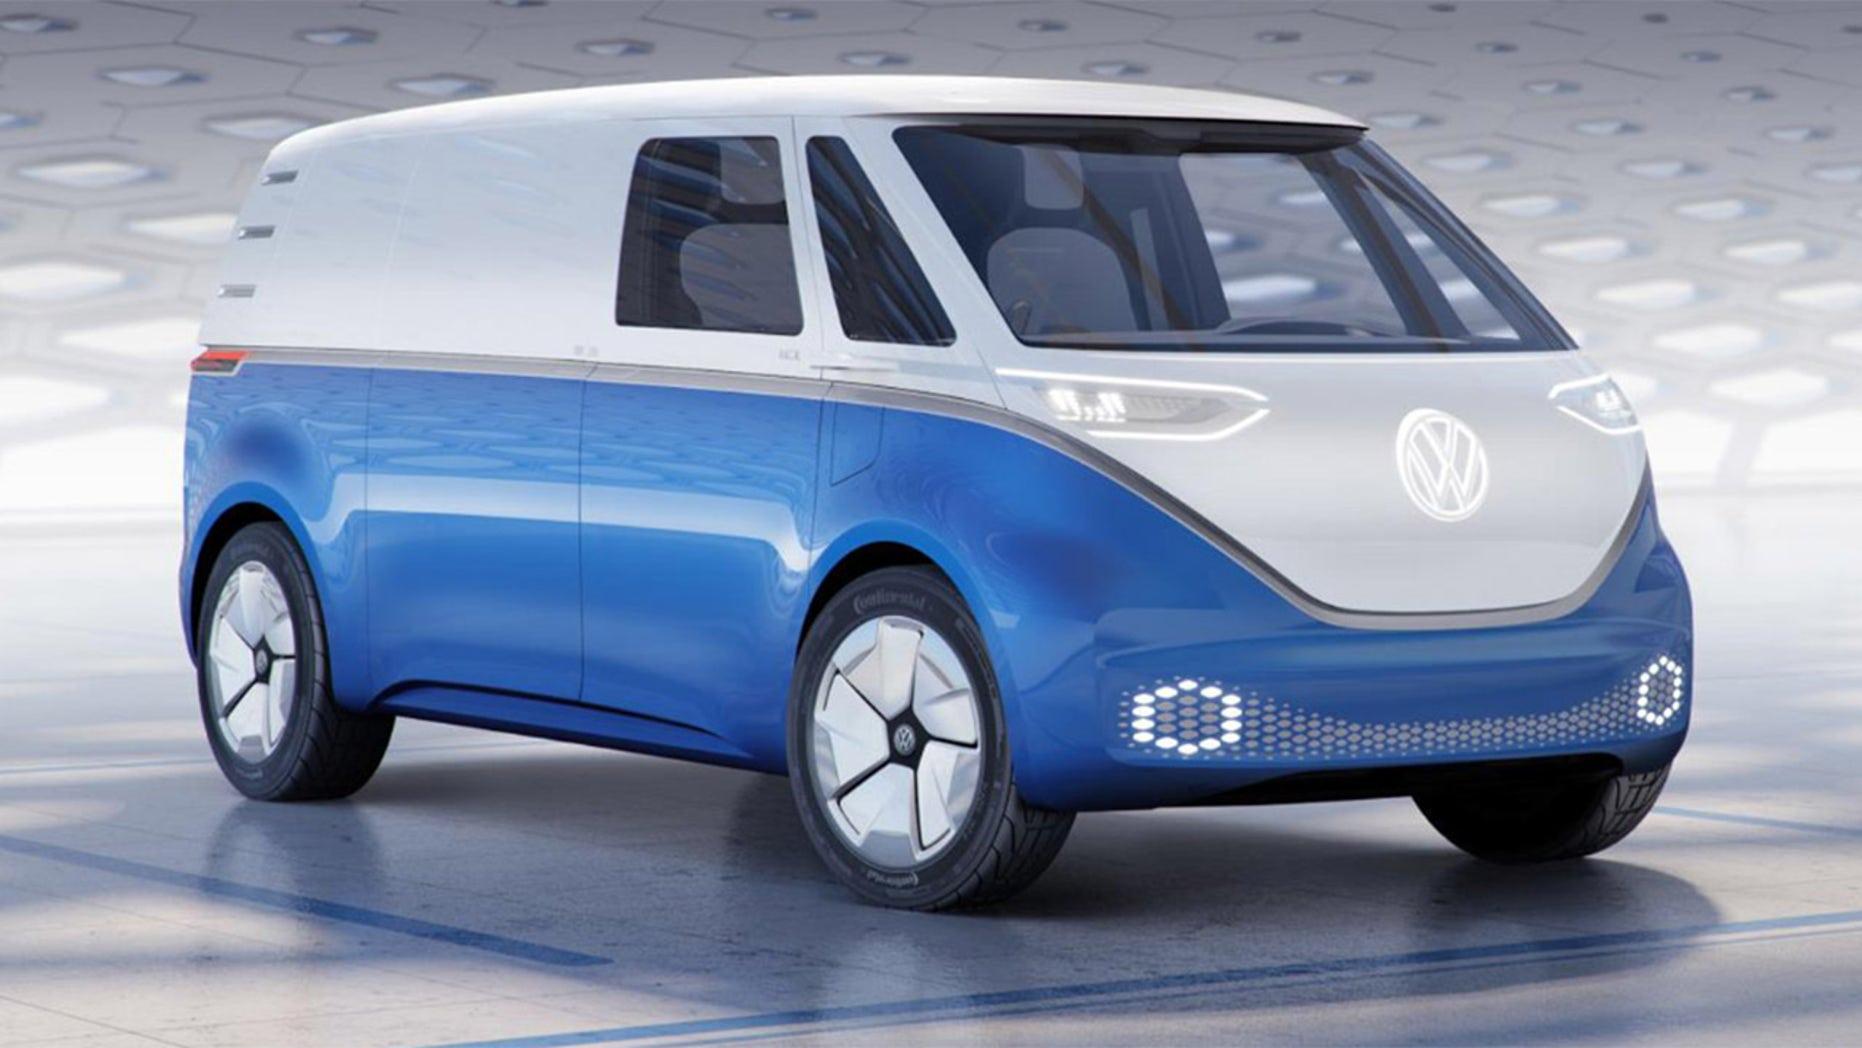 Volkswagen I D  Buzz Cargo Electric Van Delivers The Goods With Retro Style